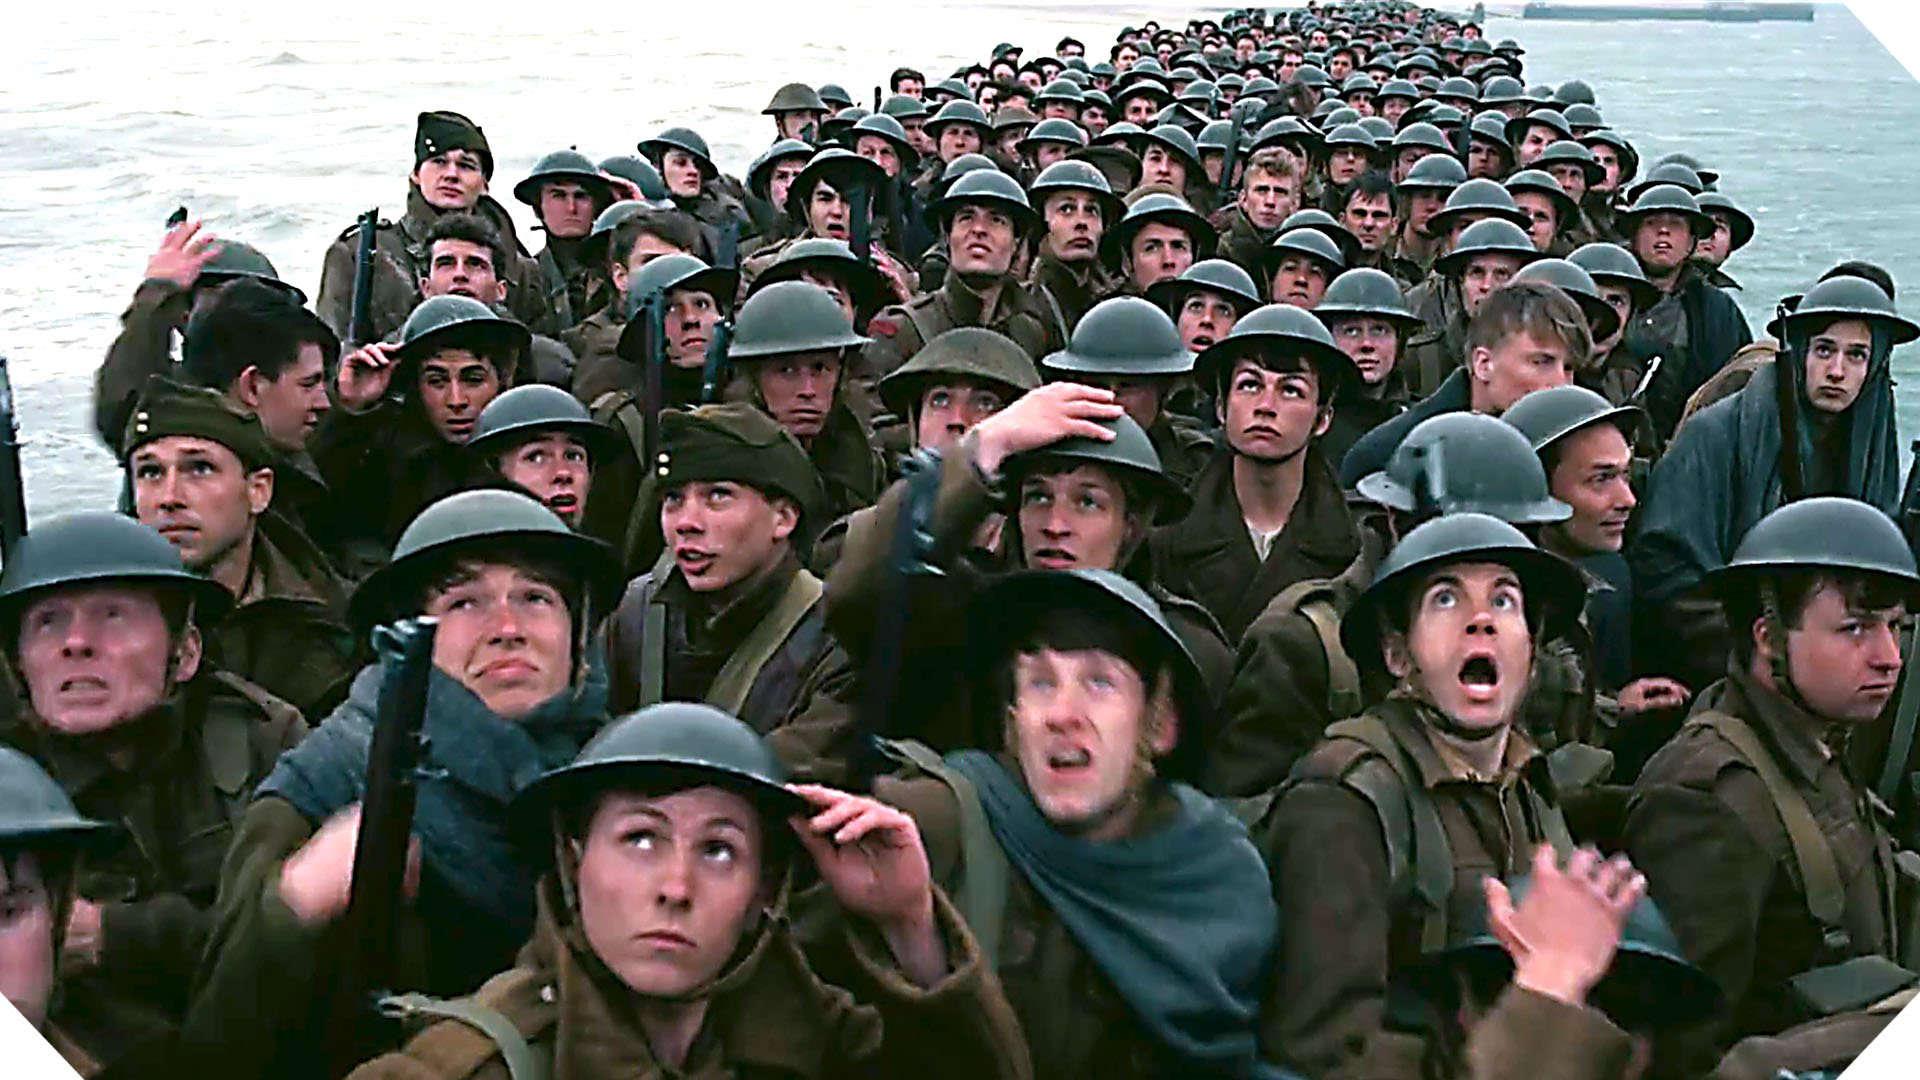 Dunkirk 10-minute prologue IMAX